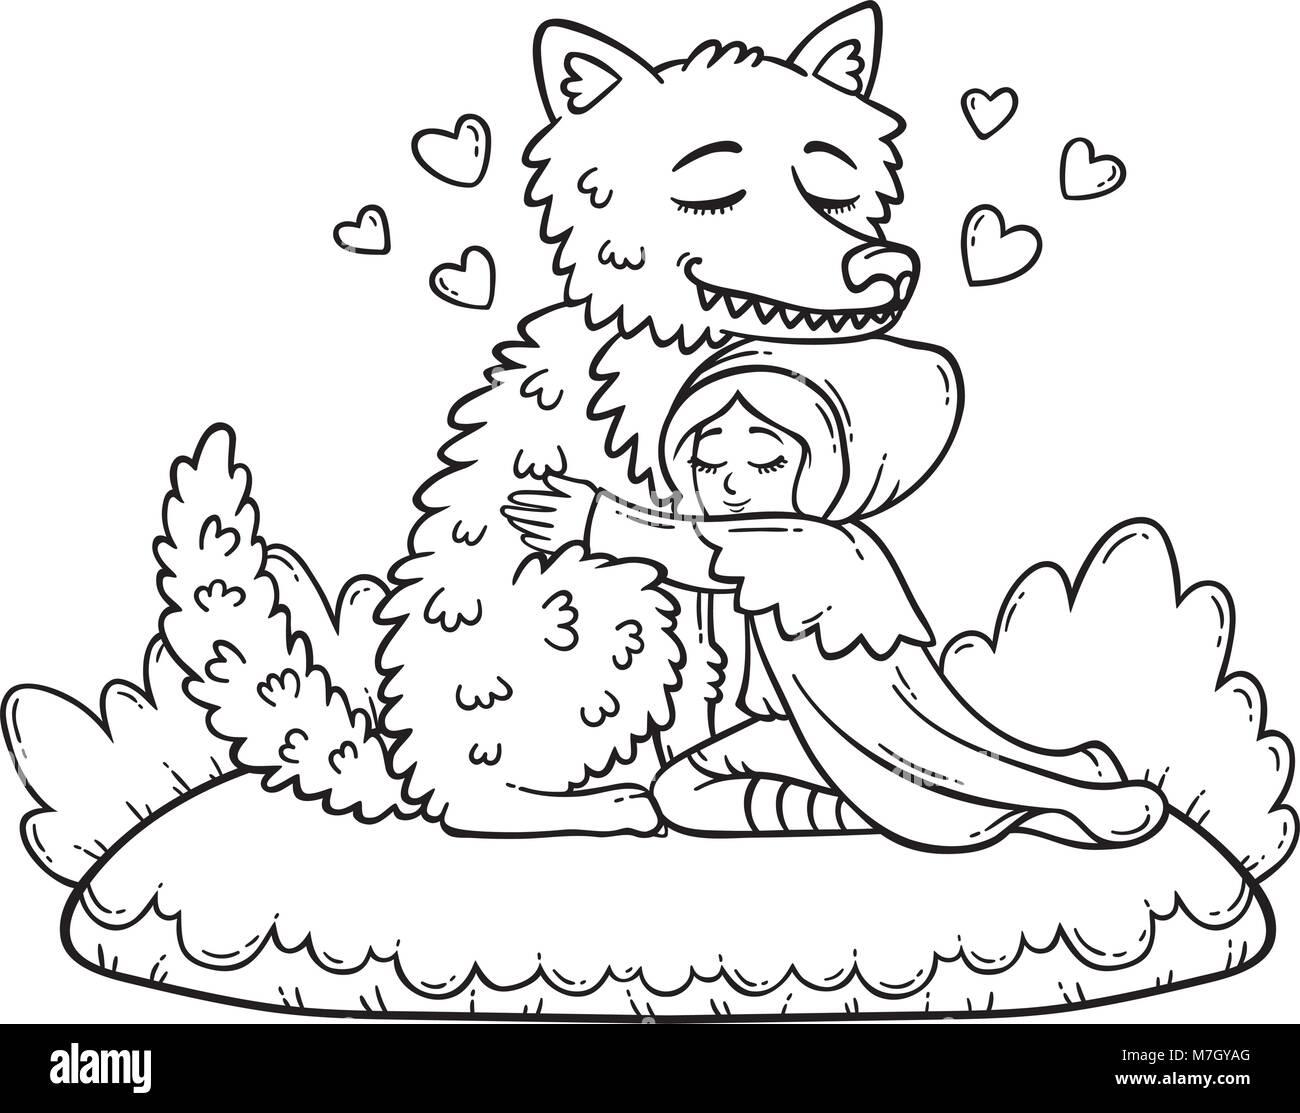 Illustration Bad Dog Coloring Book Stockfotos & Illustration Bad Dog ...